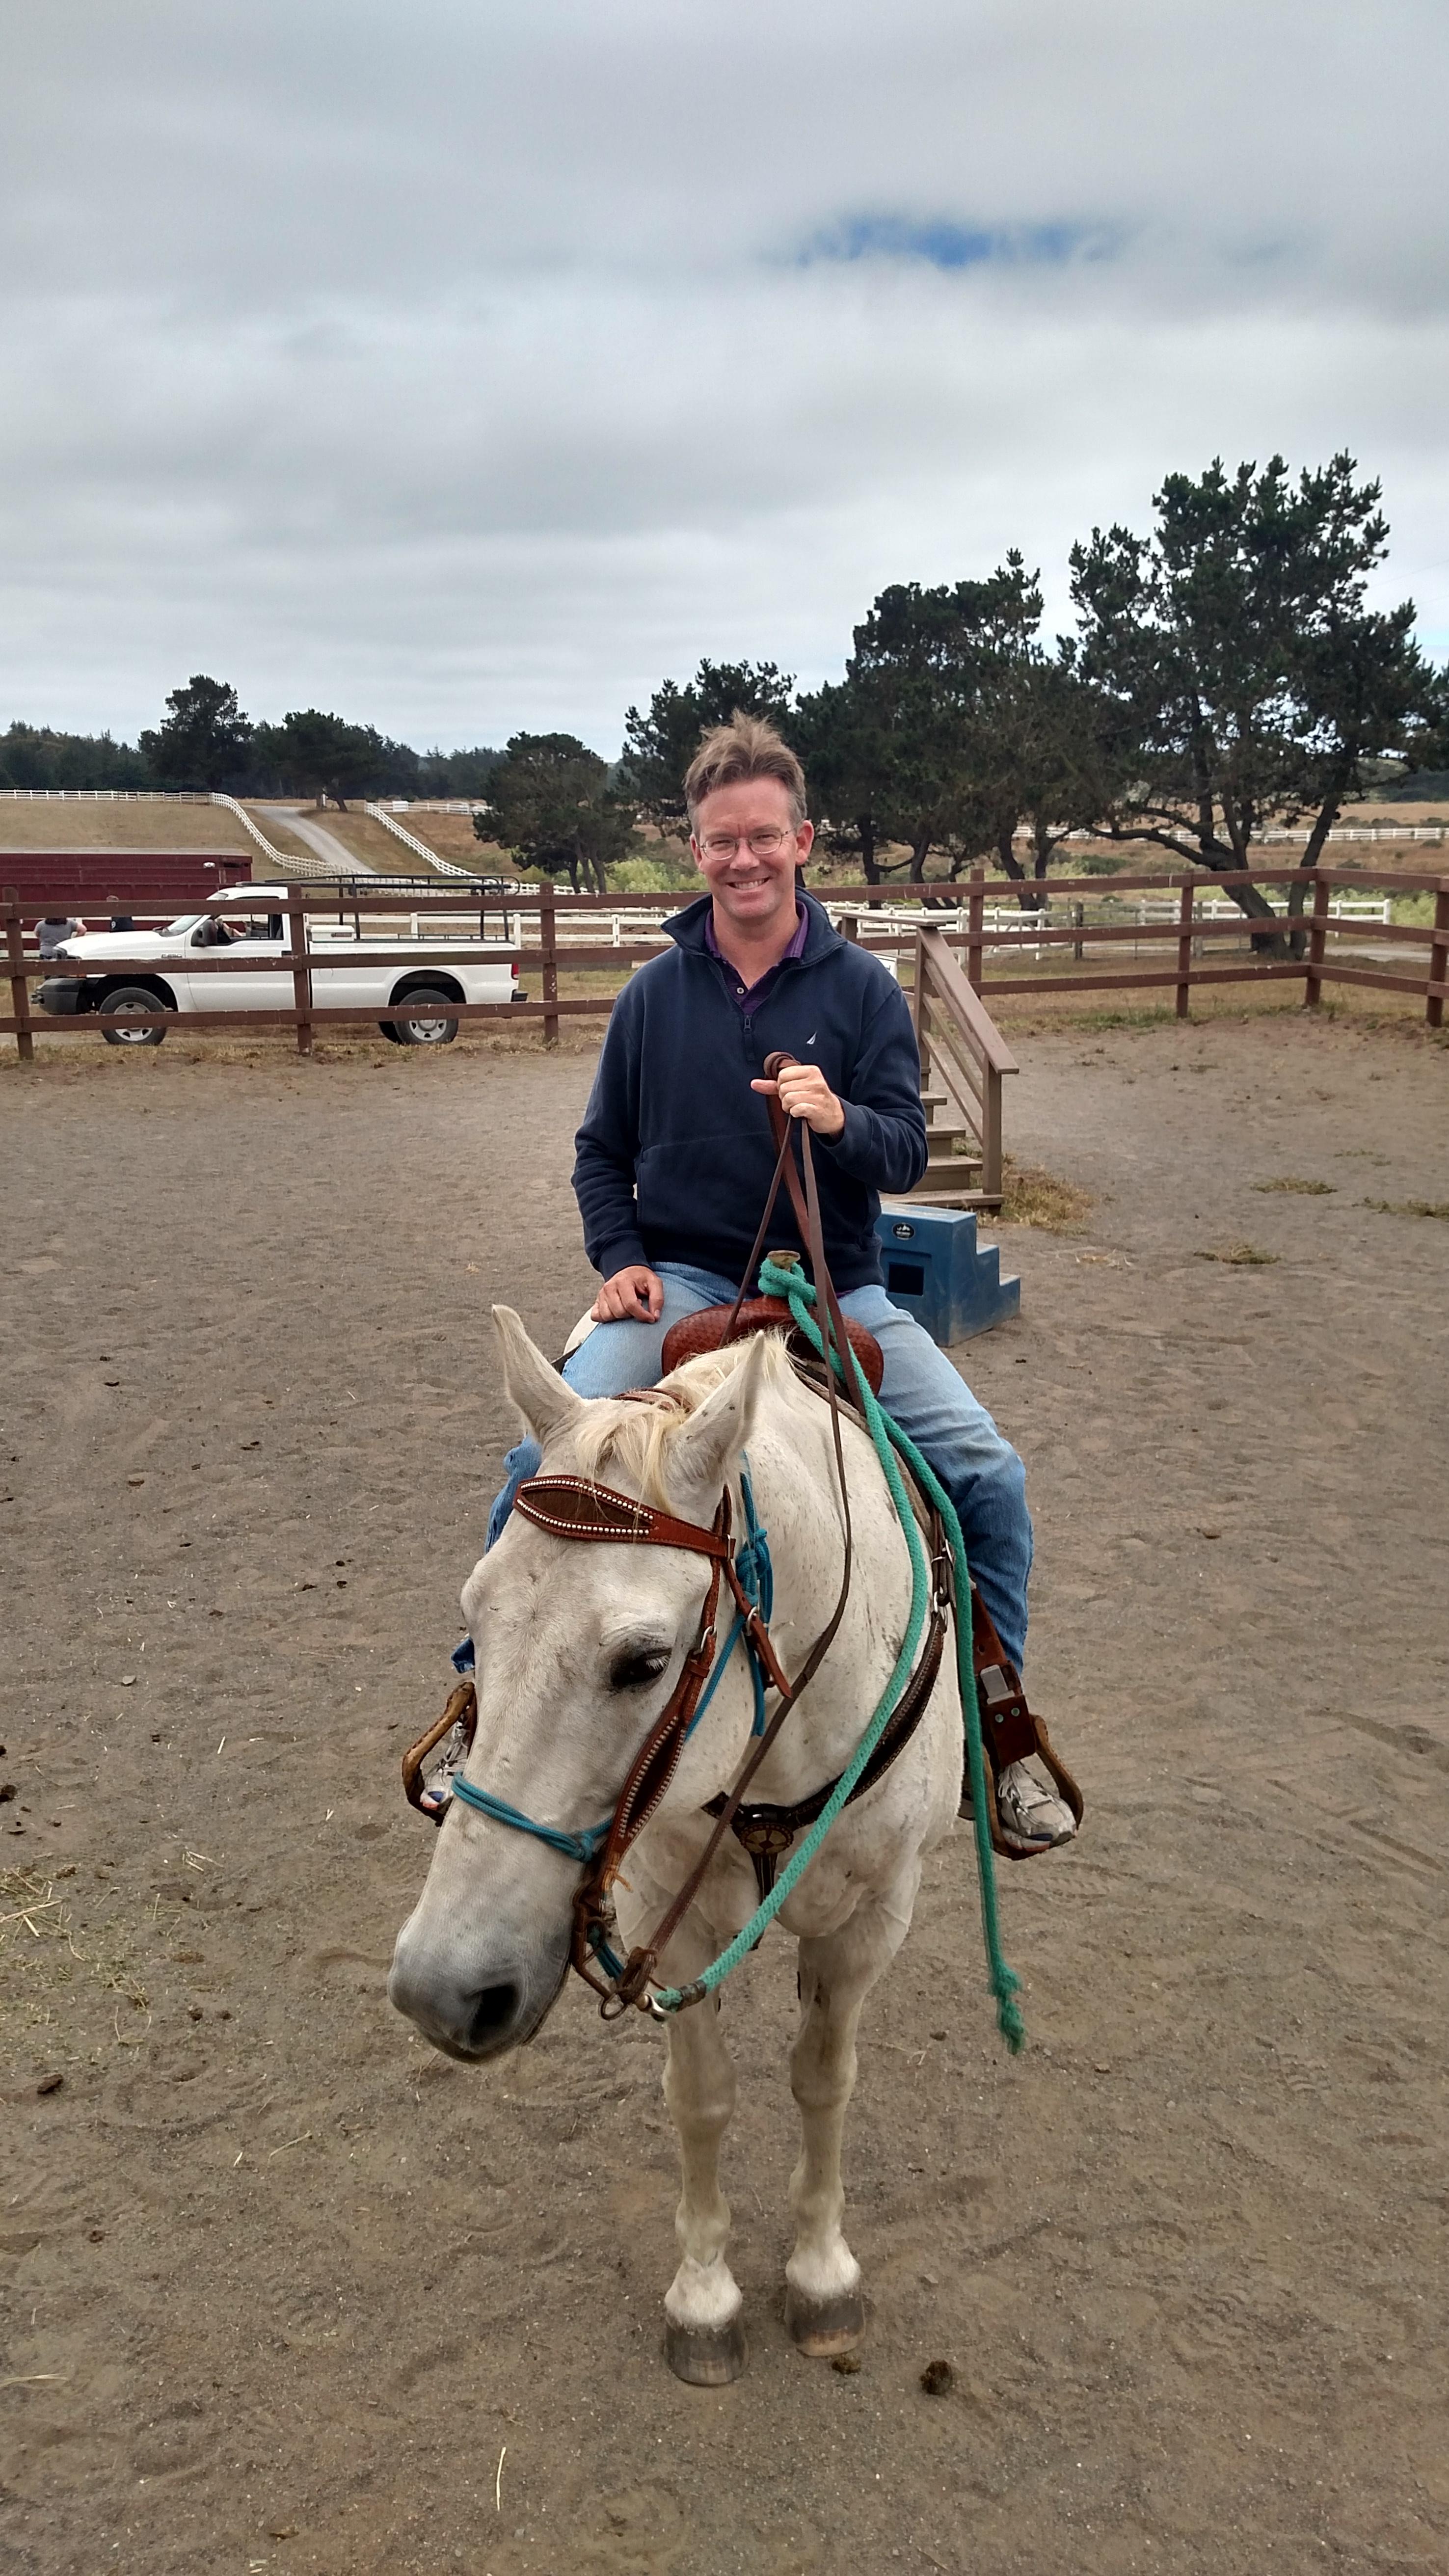 Yesterday I was up North of San Francisco at Bodega Bay. Checking out ...